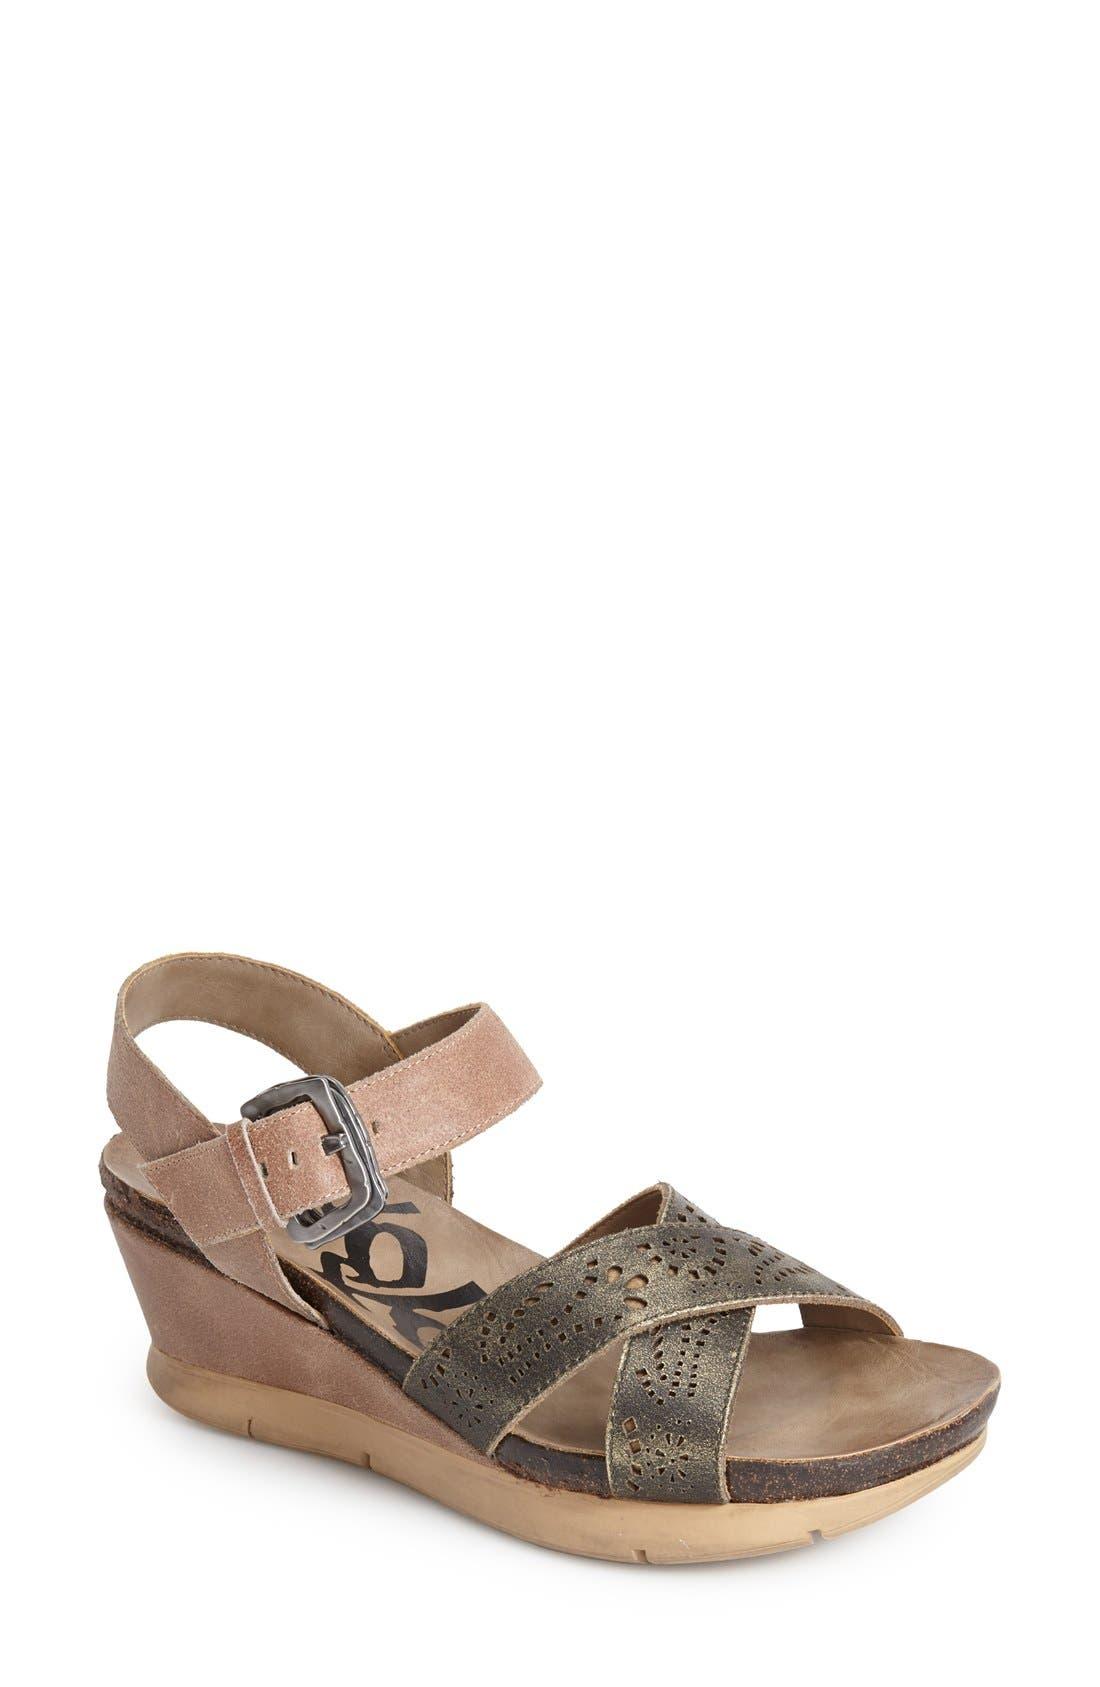 Alternate Image 1 Selected - OTBT 'Gearhart' Sandal